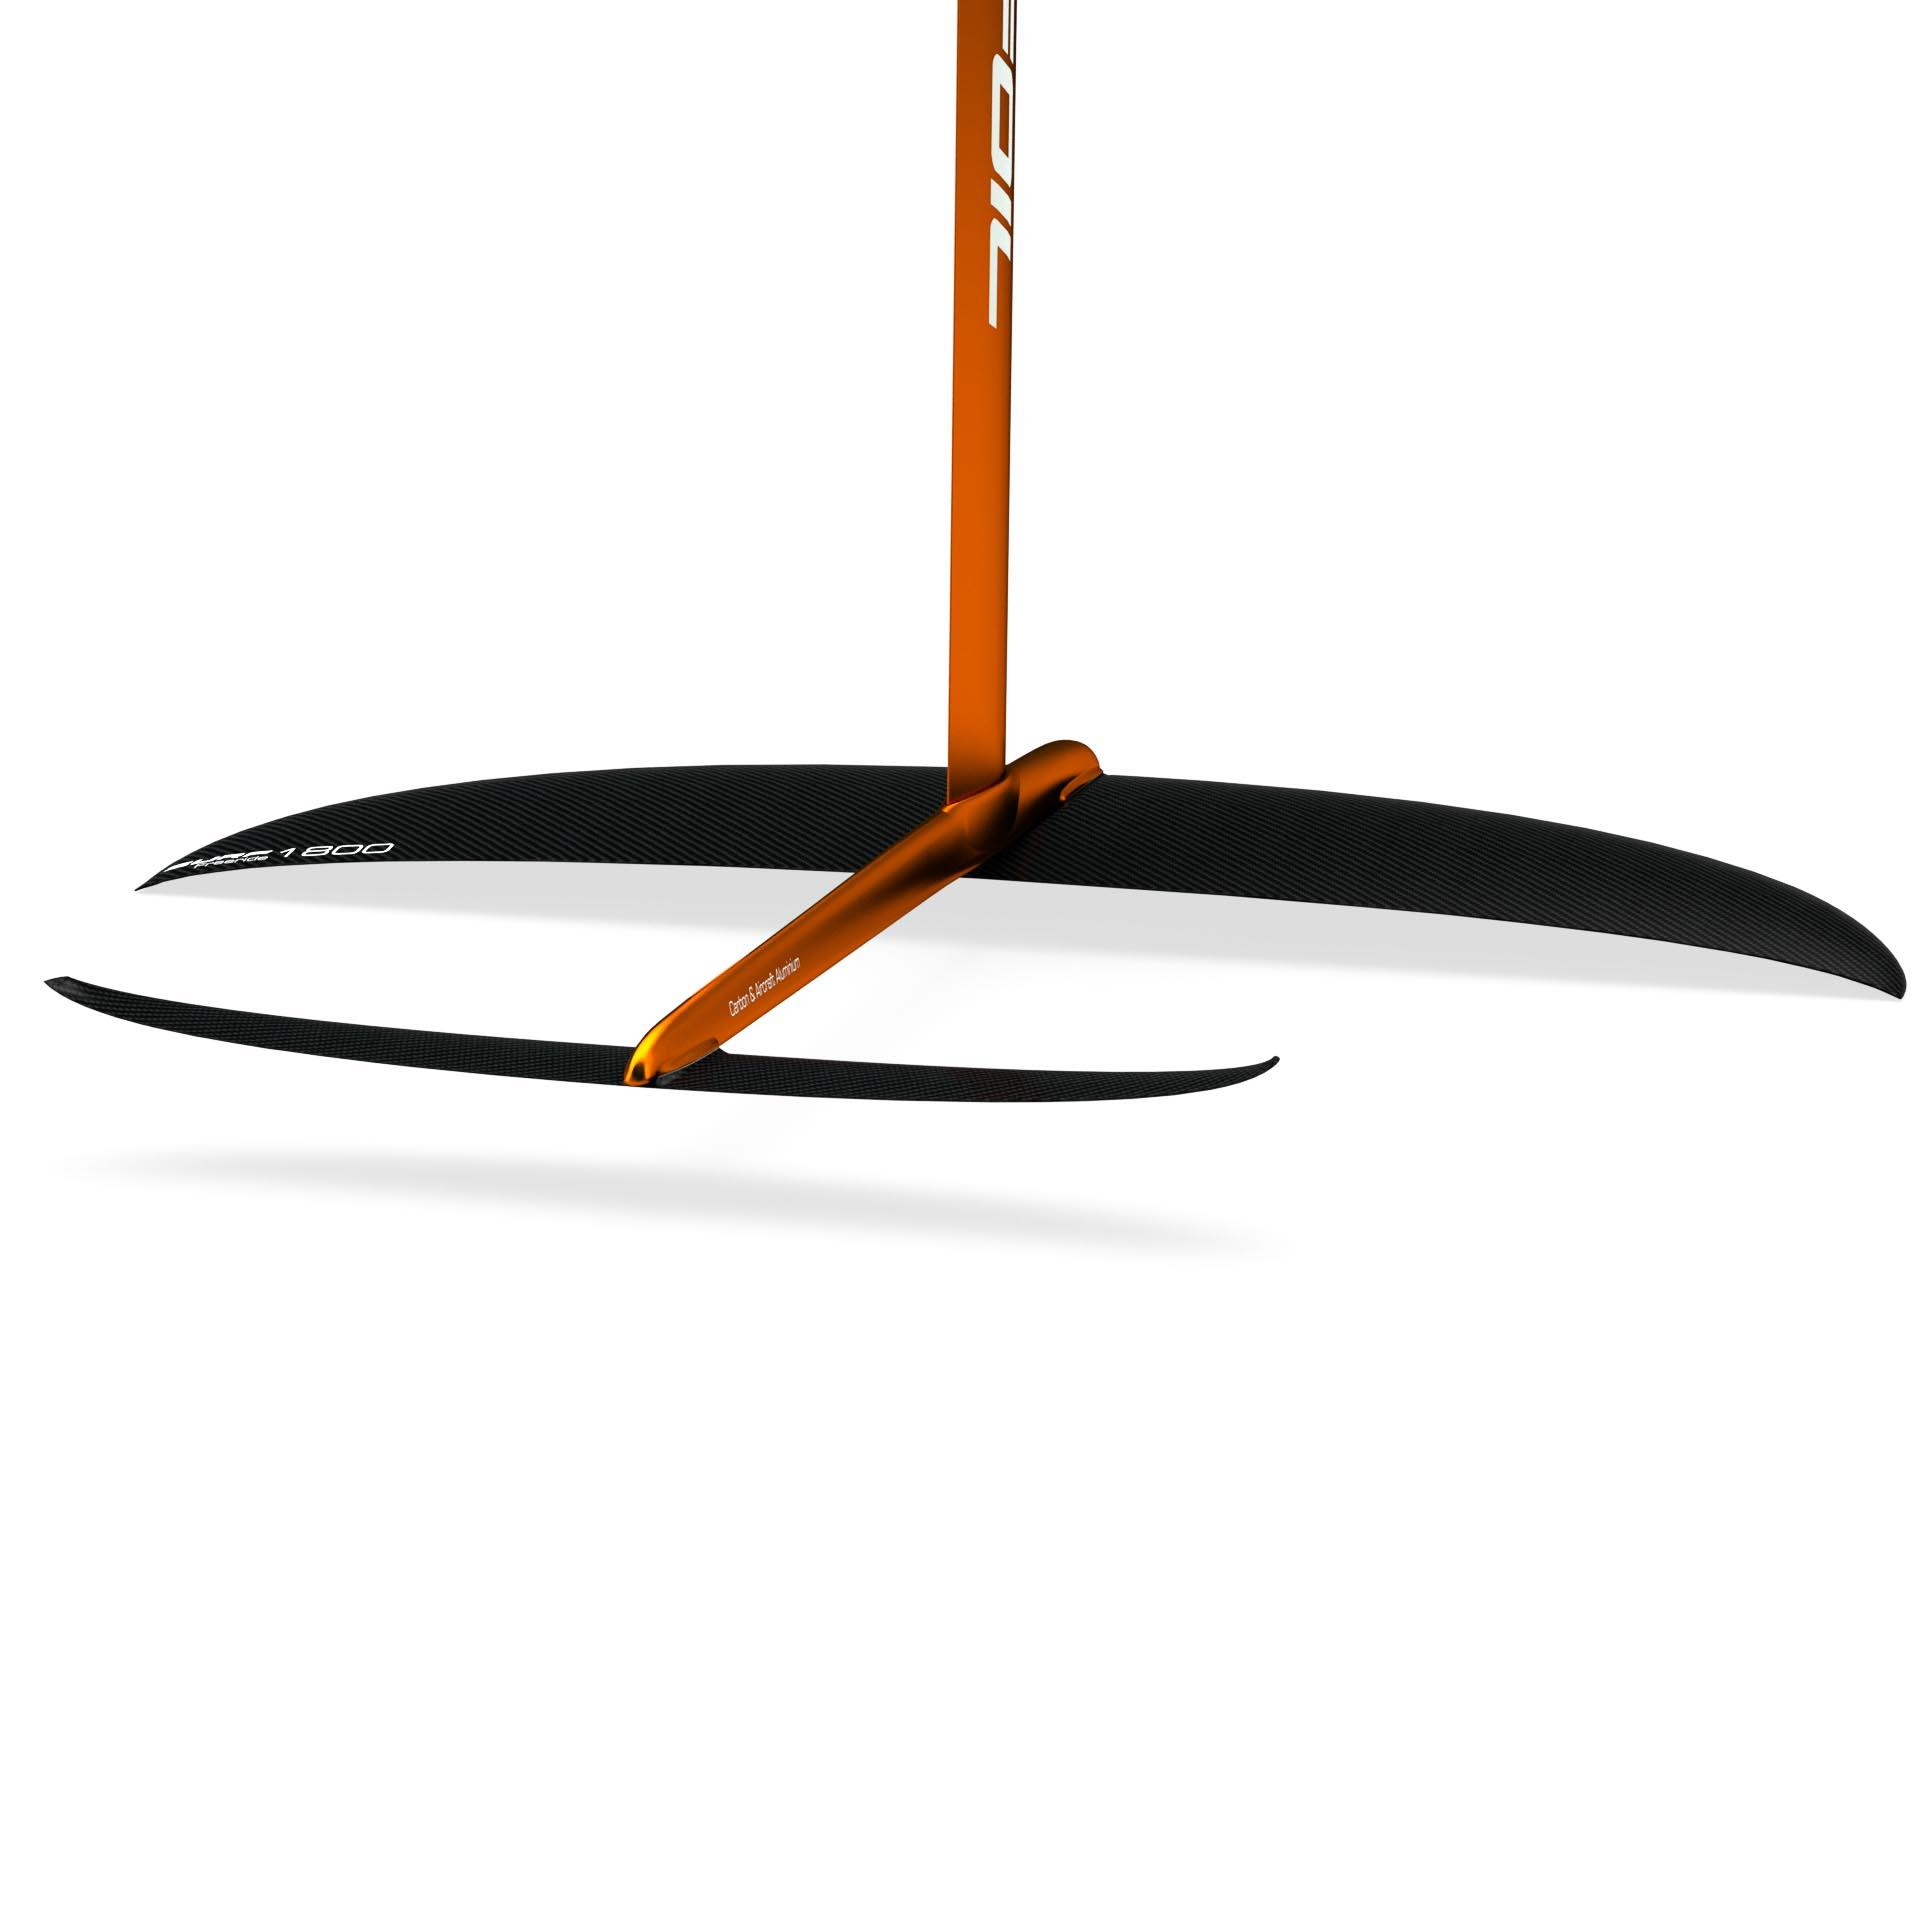 Alpinefoil winfoil supfoil surfoil hawk alu carbon 11